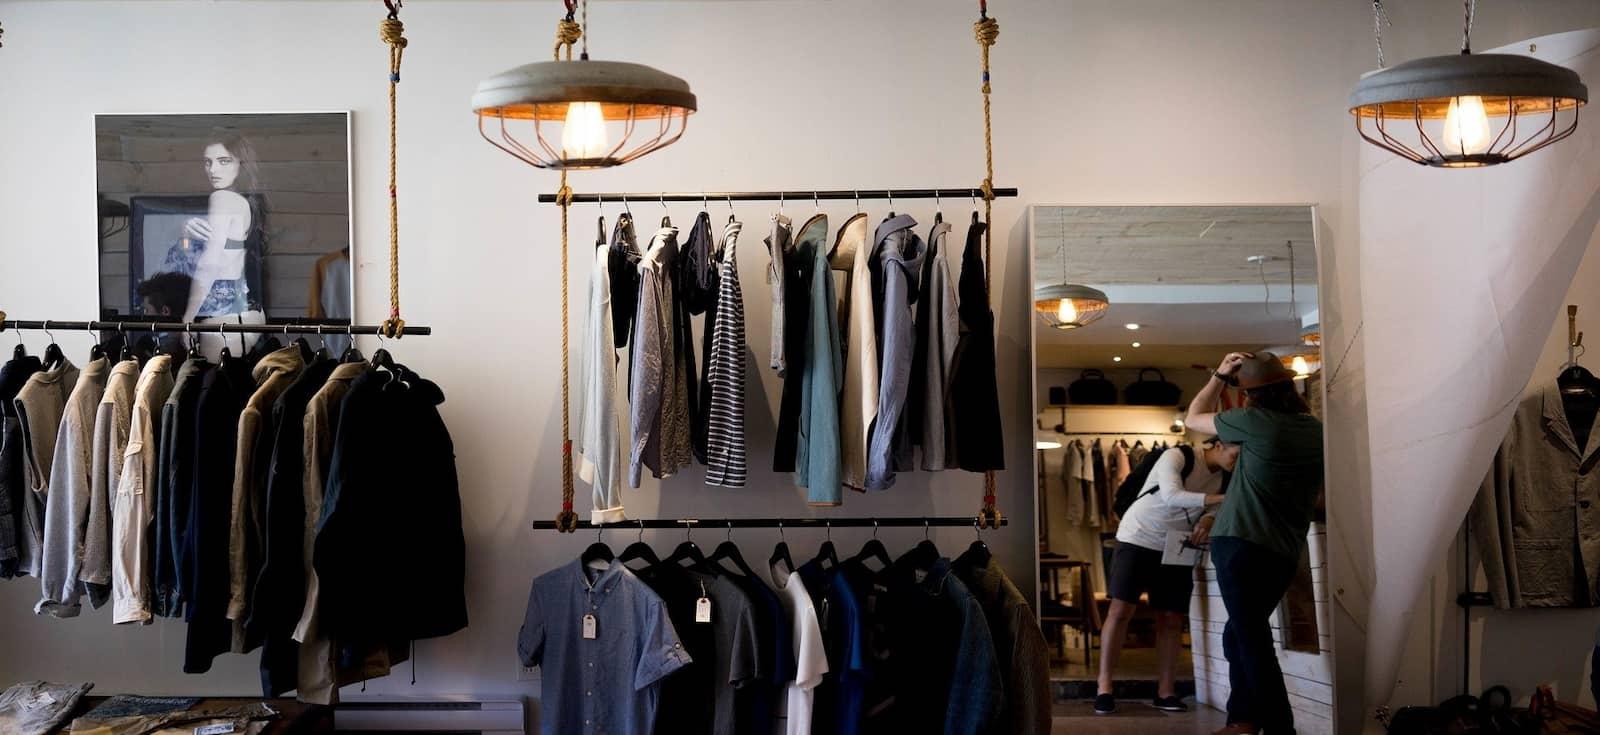 Sector del retail. Moda. Ropa. (Imagen de Free-Photos en Pixabay)